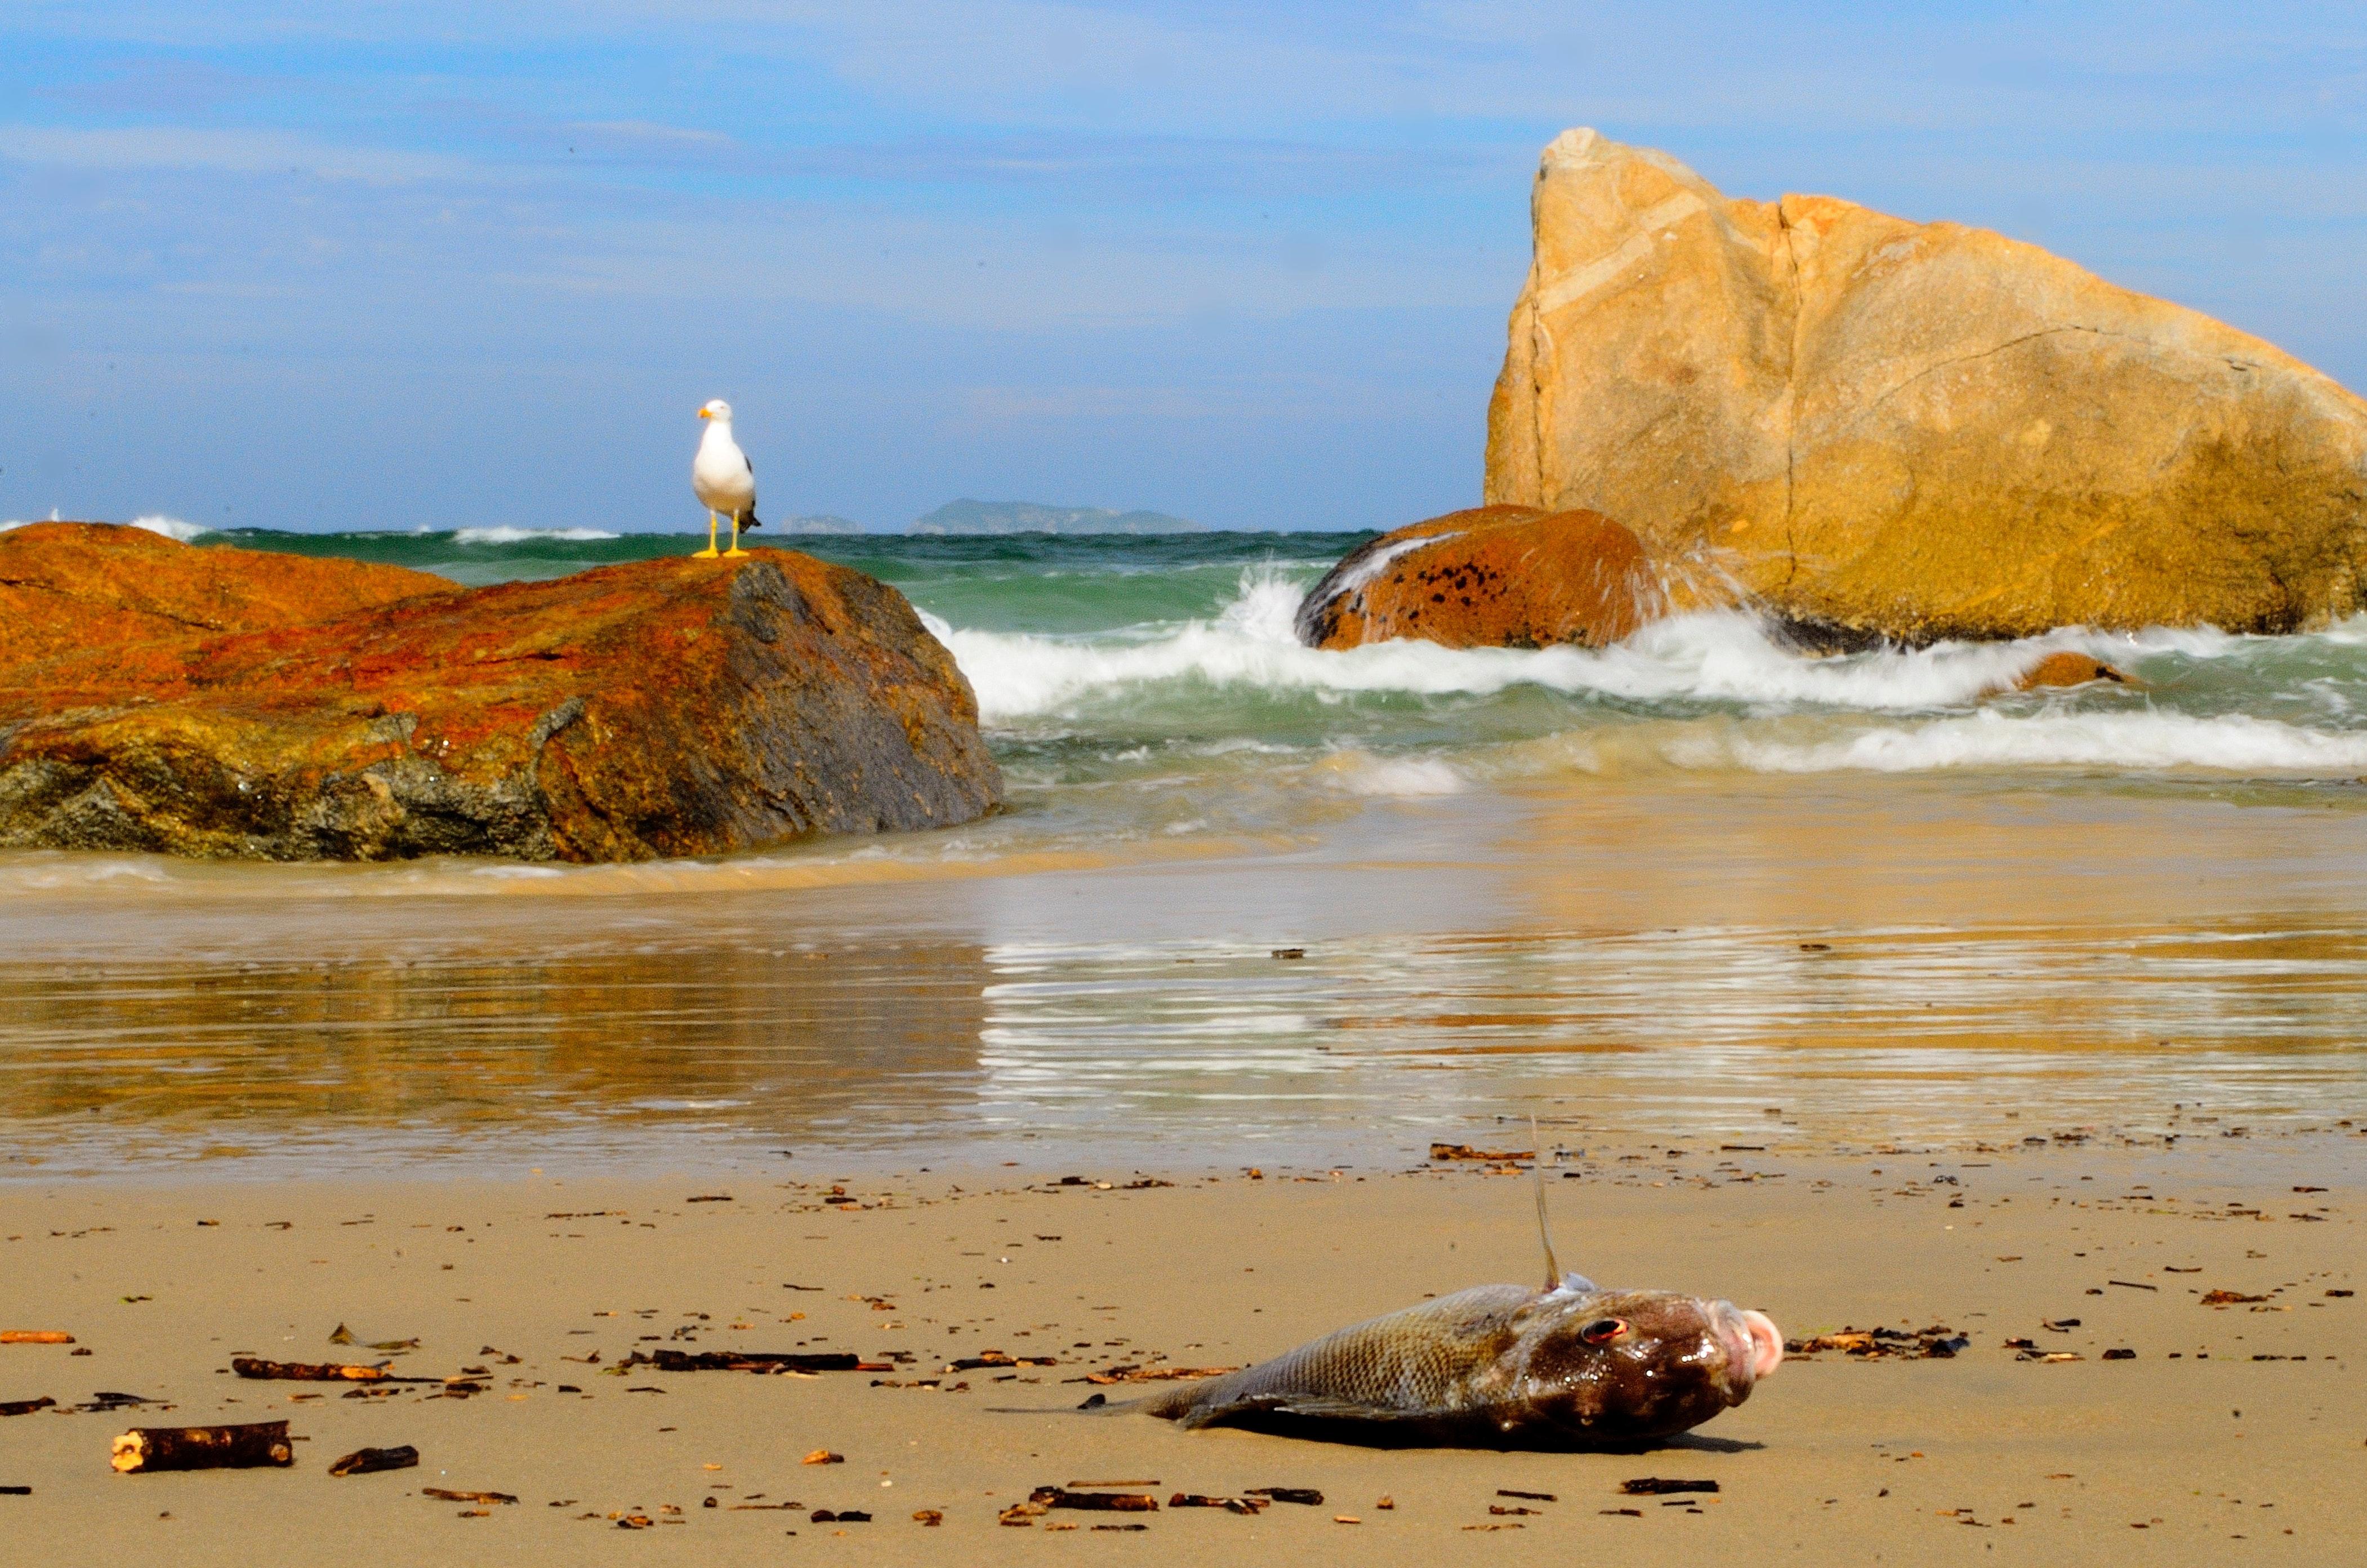 Dead fish on seashore during daytime photo